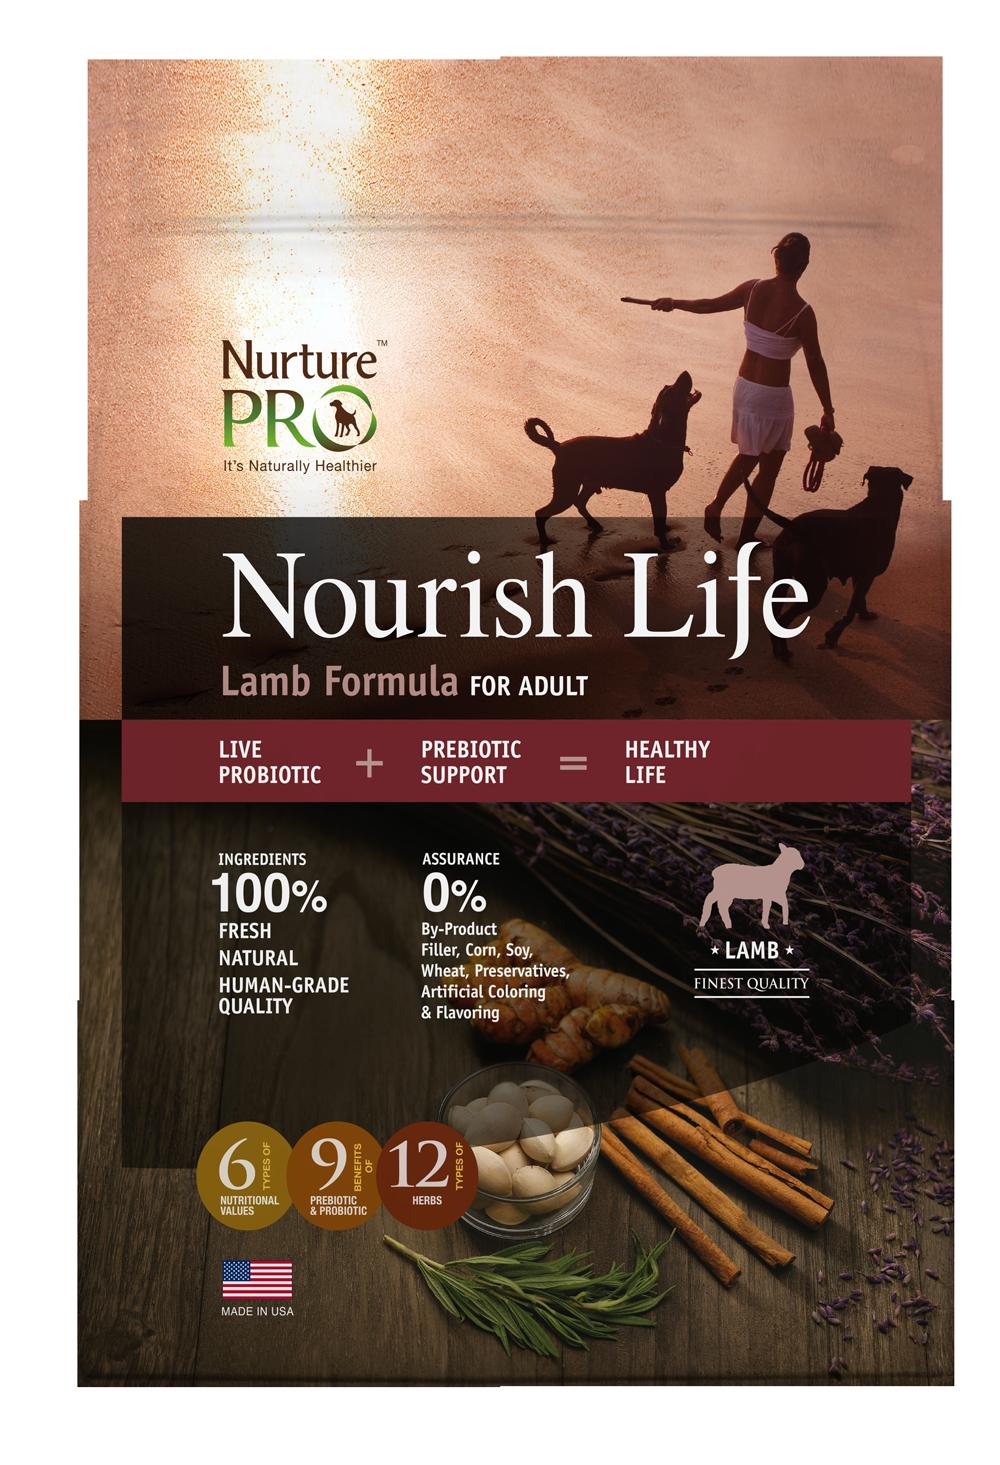 Nourish Life Cat Food Review